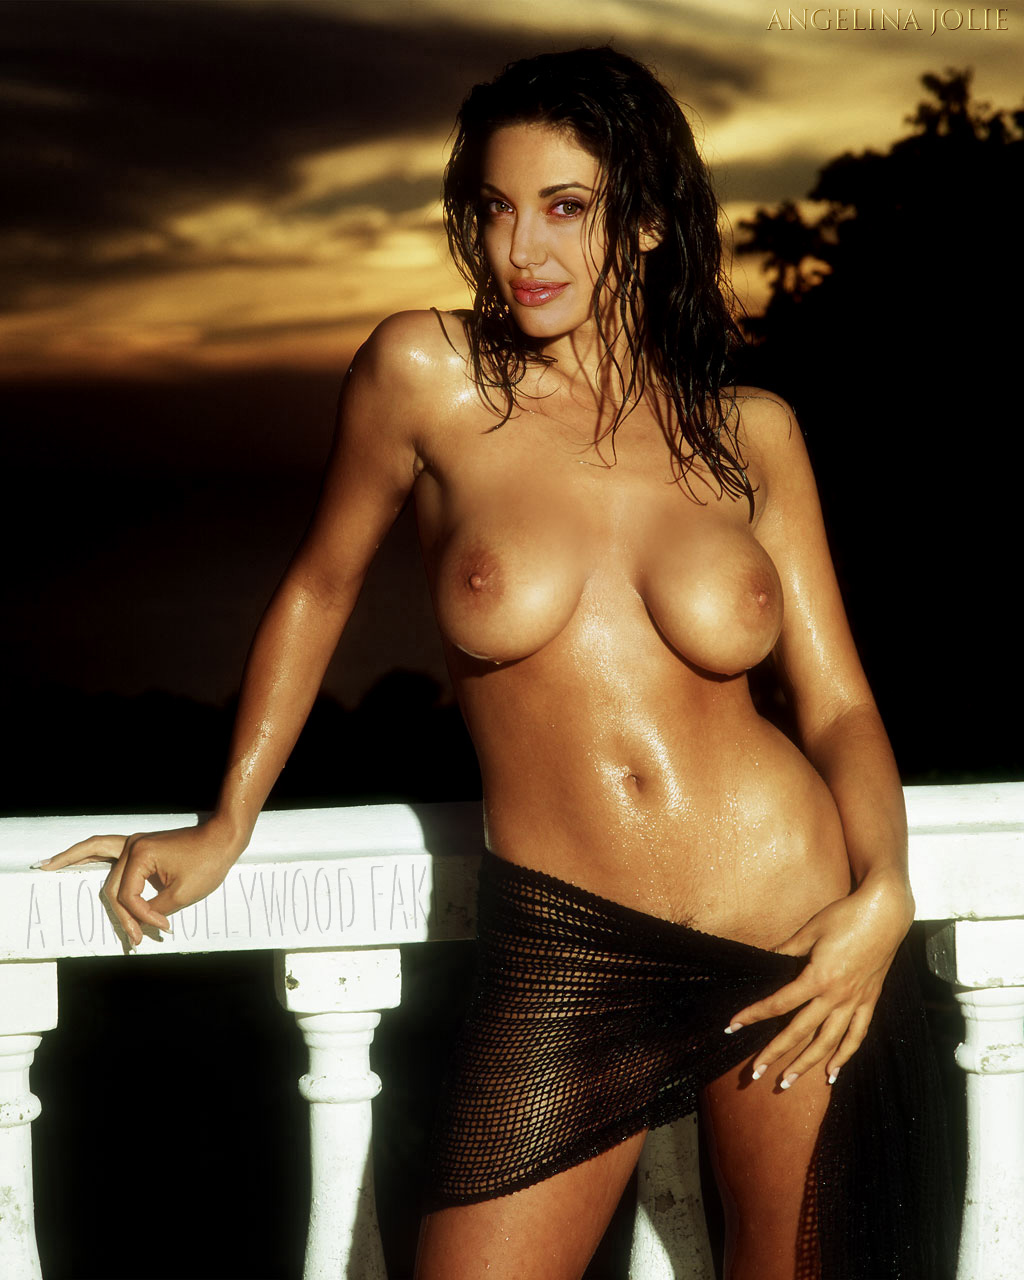 Angelina Jolie Голая Полностью голая анджелина джоли